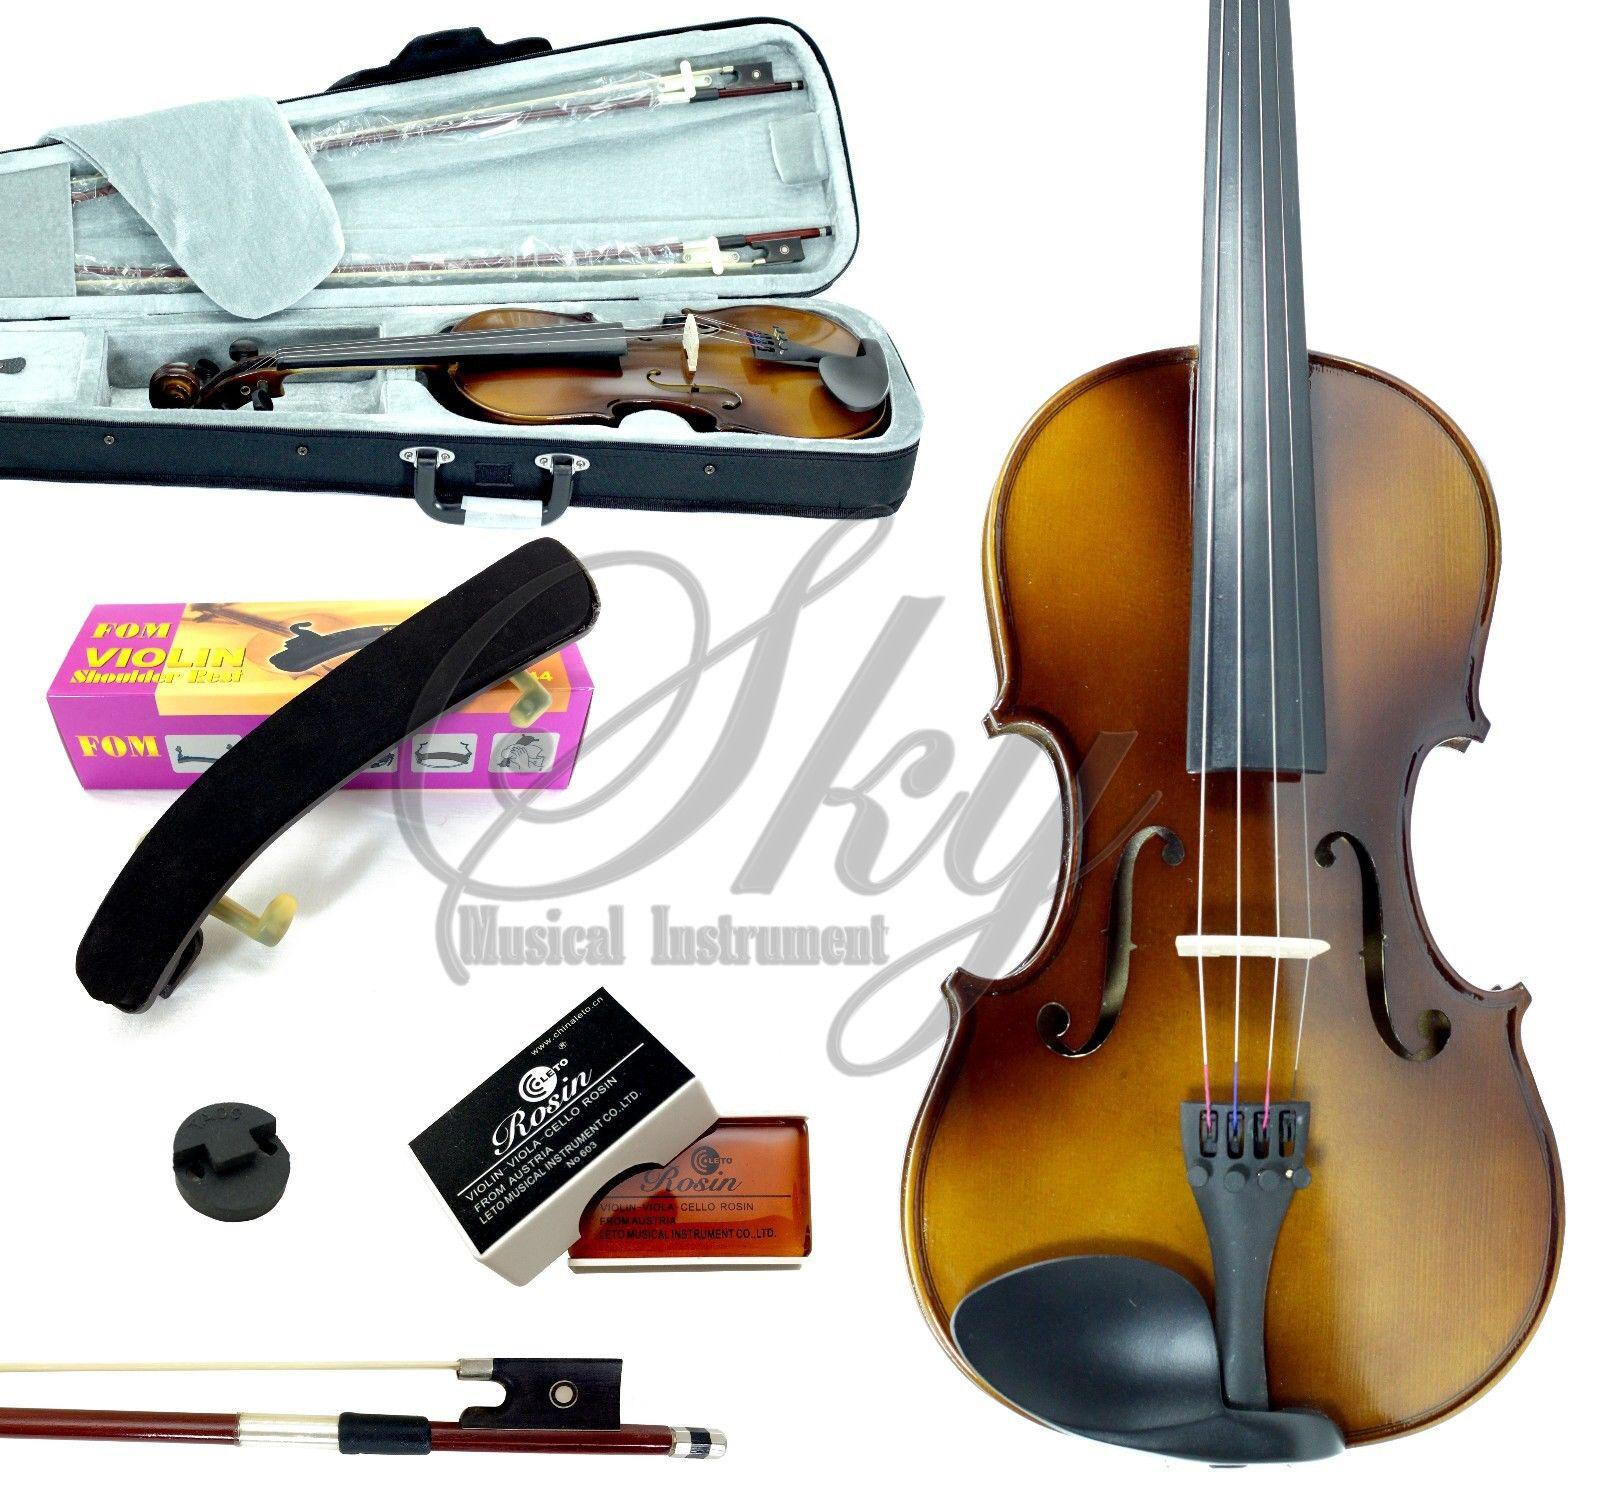 1 4 Größe Violin w Case Bow Shoulder Rest, Mute GREAT GIFT PACKAGE